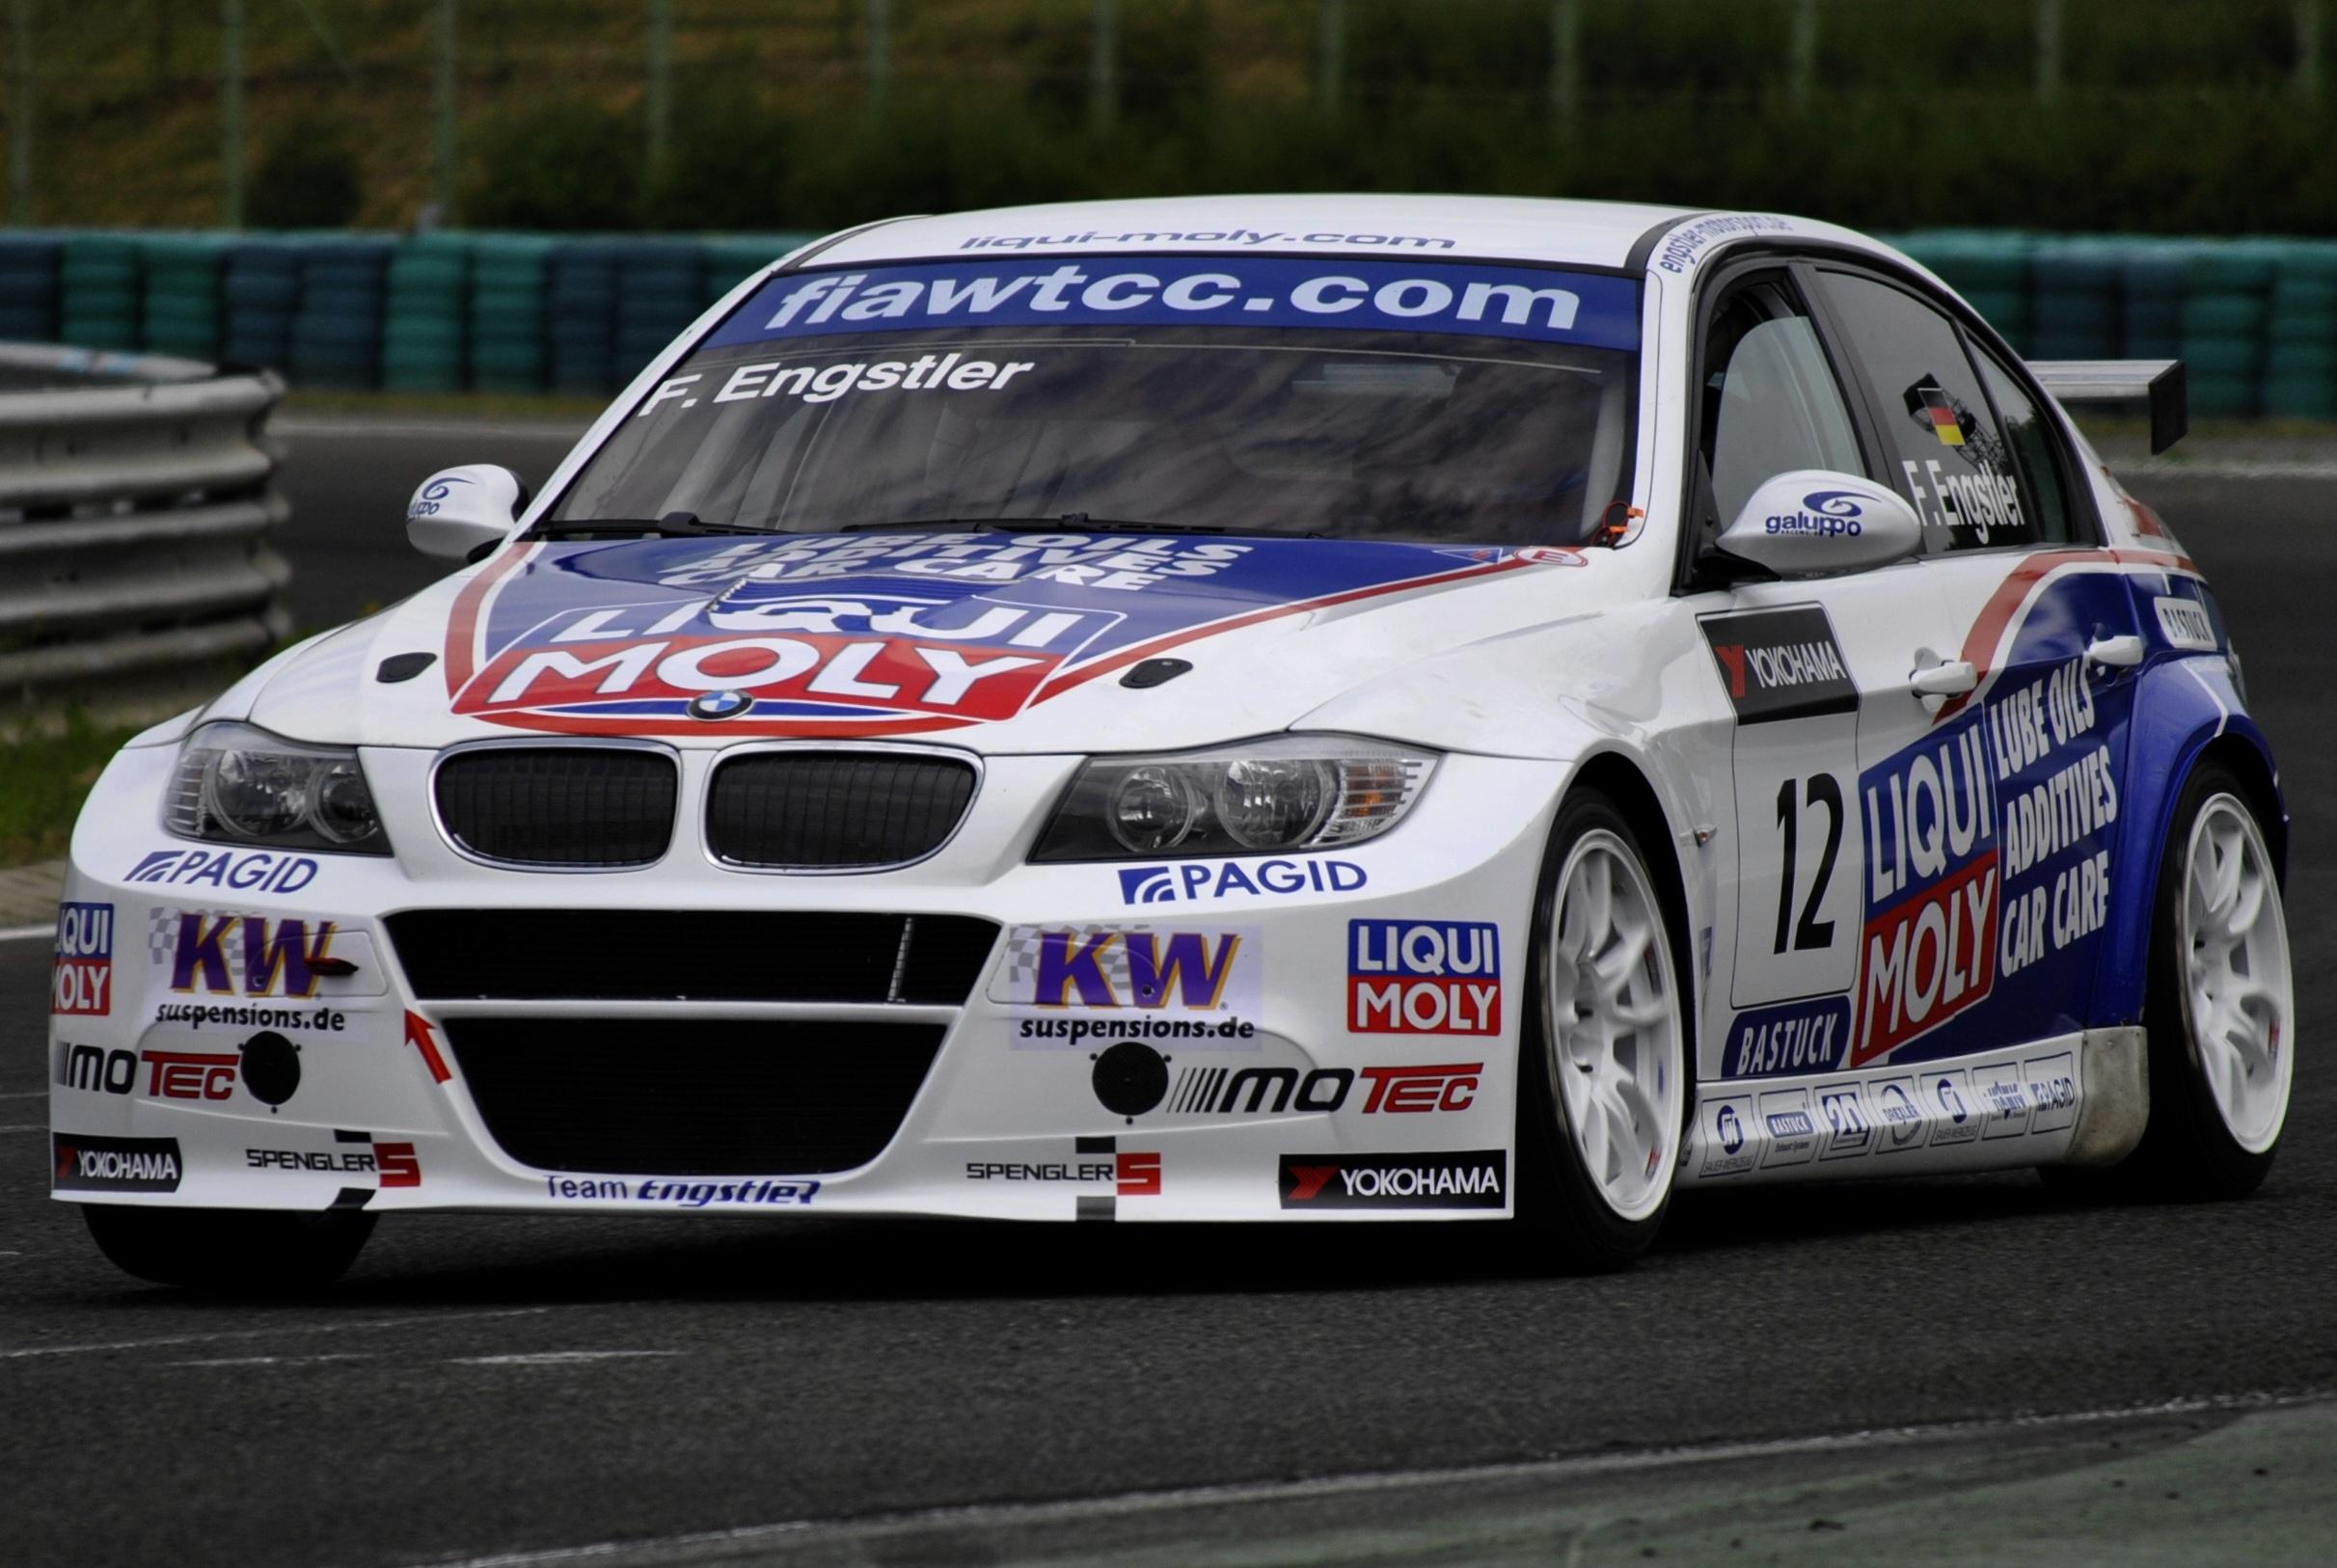 Free Images : Sports Car, Race Car, Race Track, Motorsport, Land Vehicle,  Wtcc Race, Fiawtcc, Hungaroring, Touring Car, Auto Racing, Automobile Make,  ...